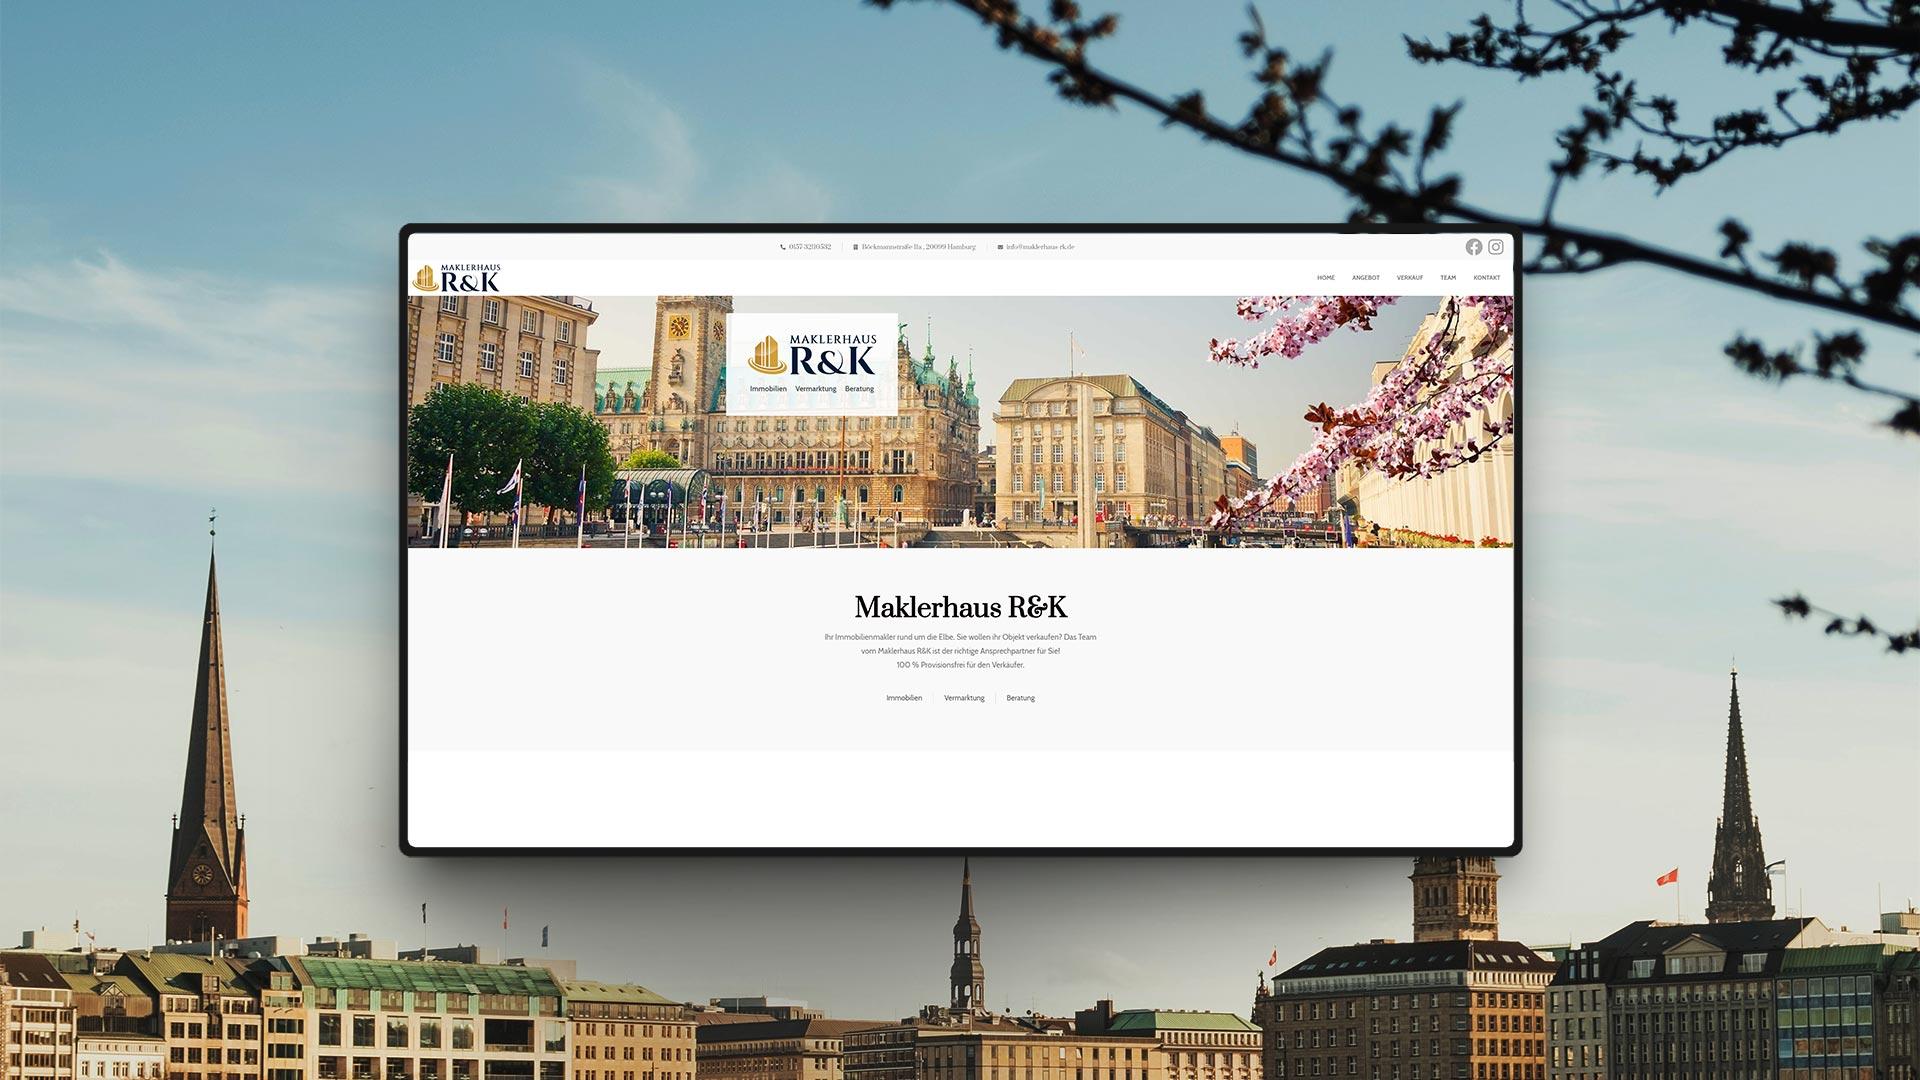 Mockup_Webdesign_2